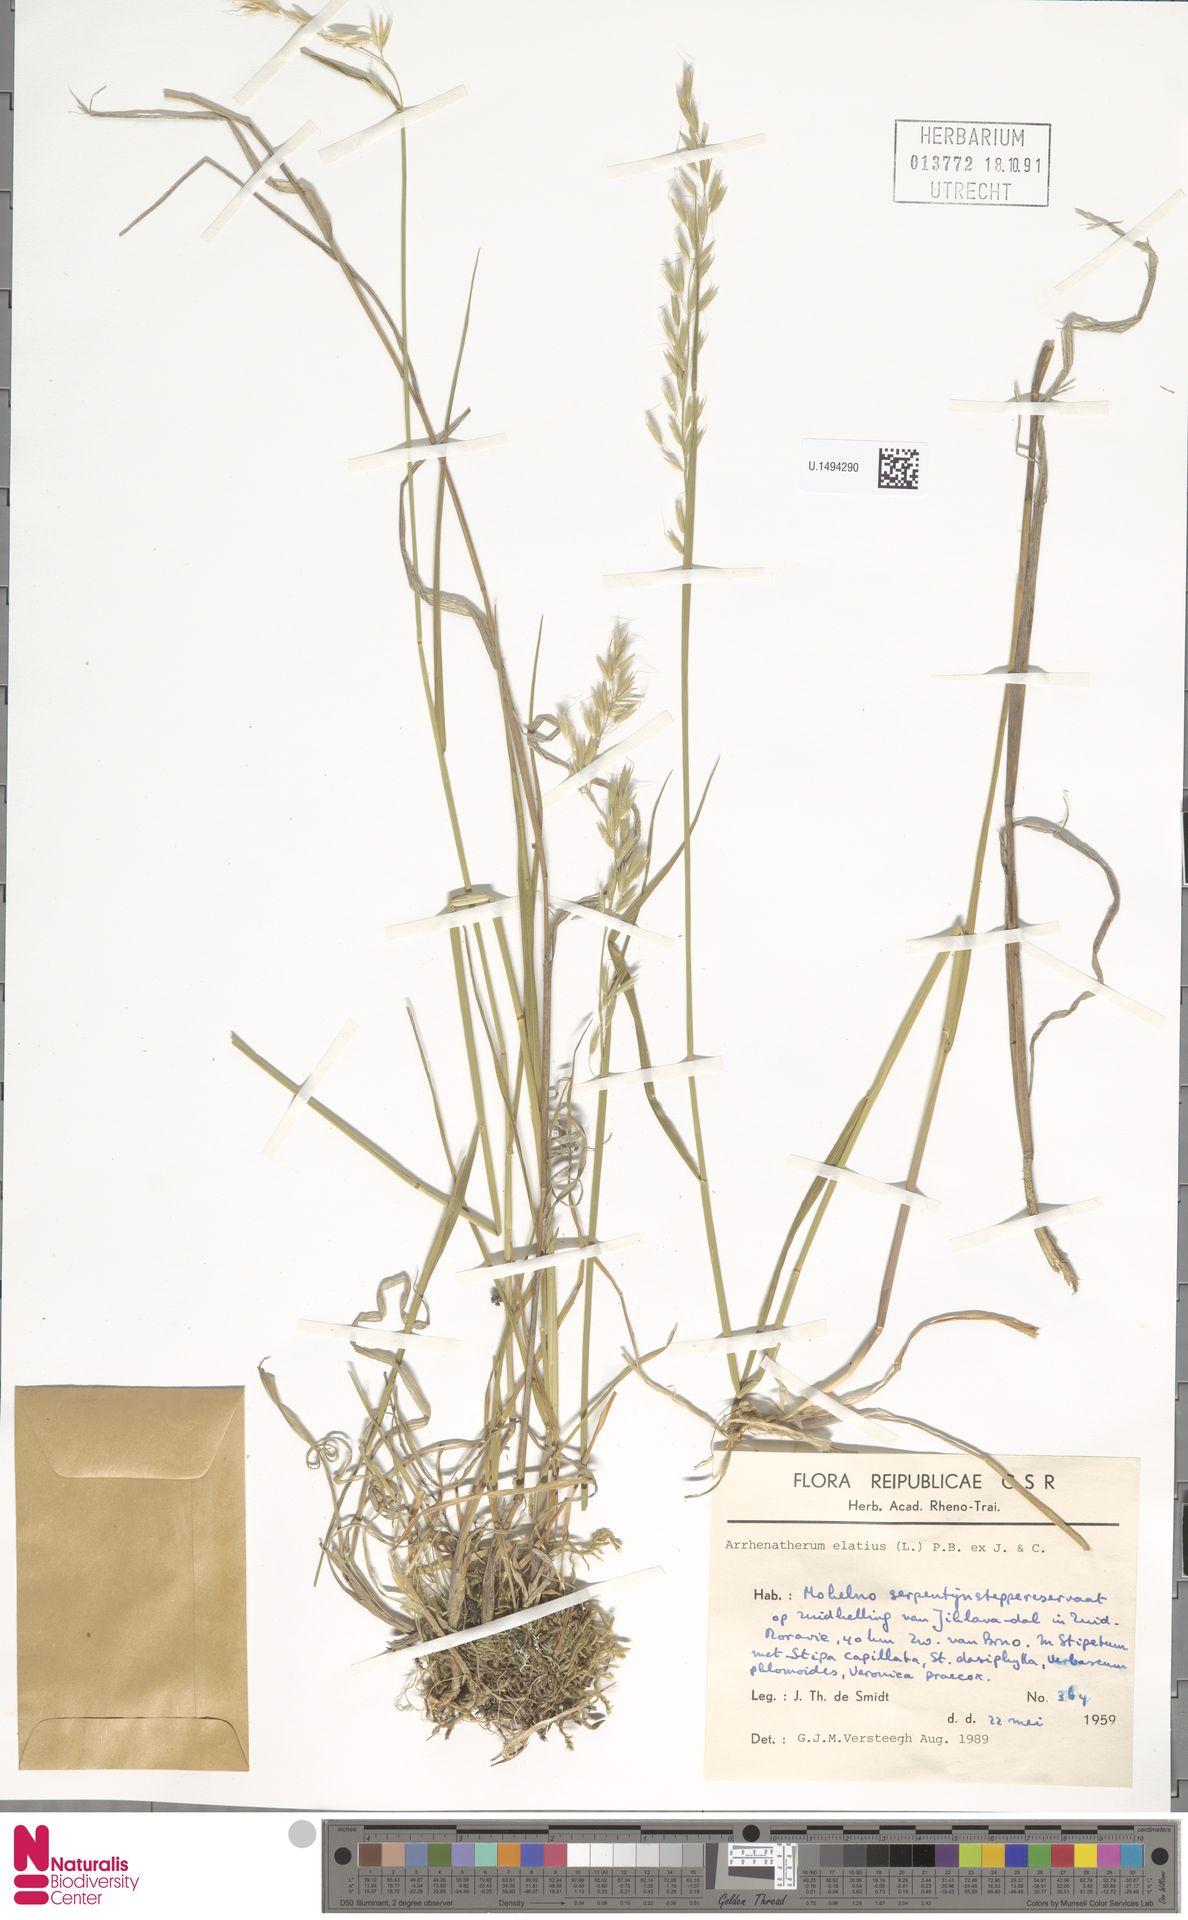 U.1494290 | Arrhenatherum elatius (L.) P.Beauv. ex J.Presl & C.Presl